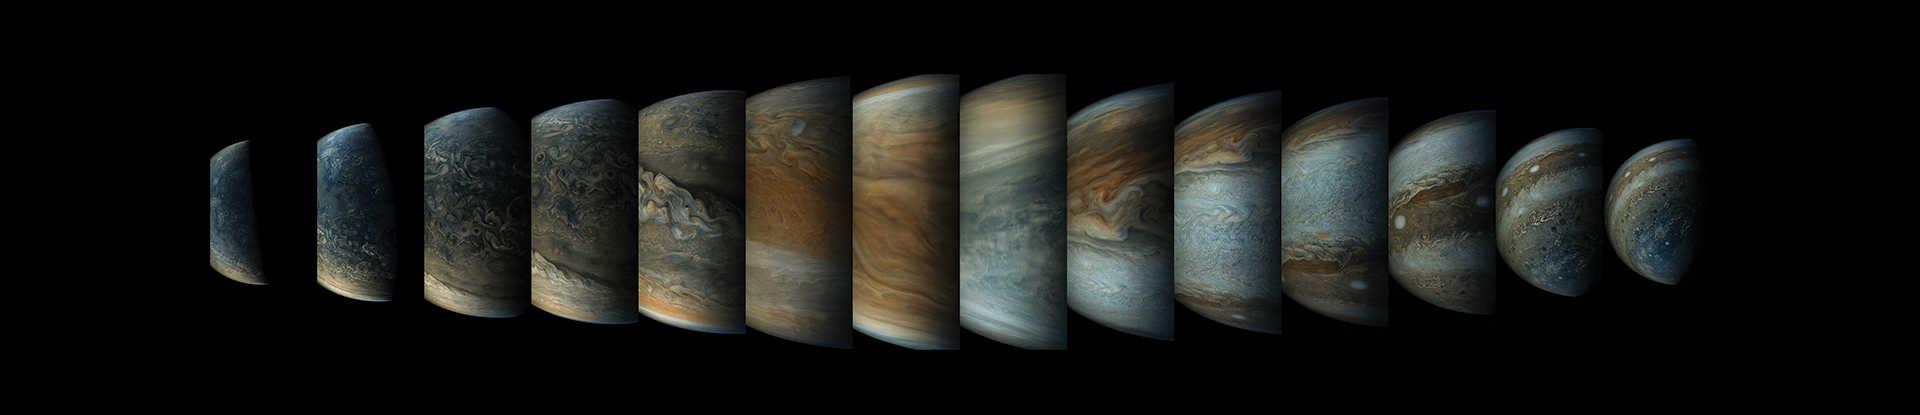 Jupiter montage